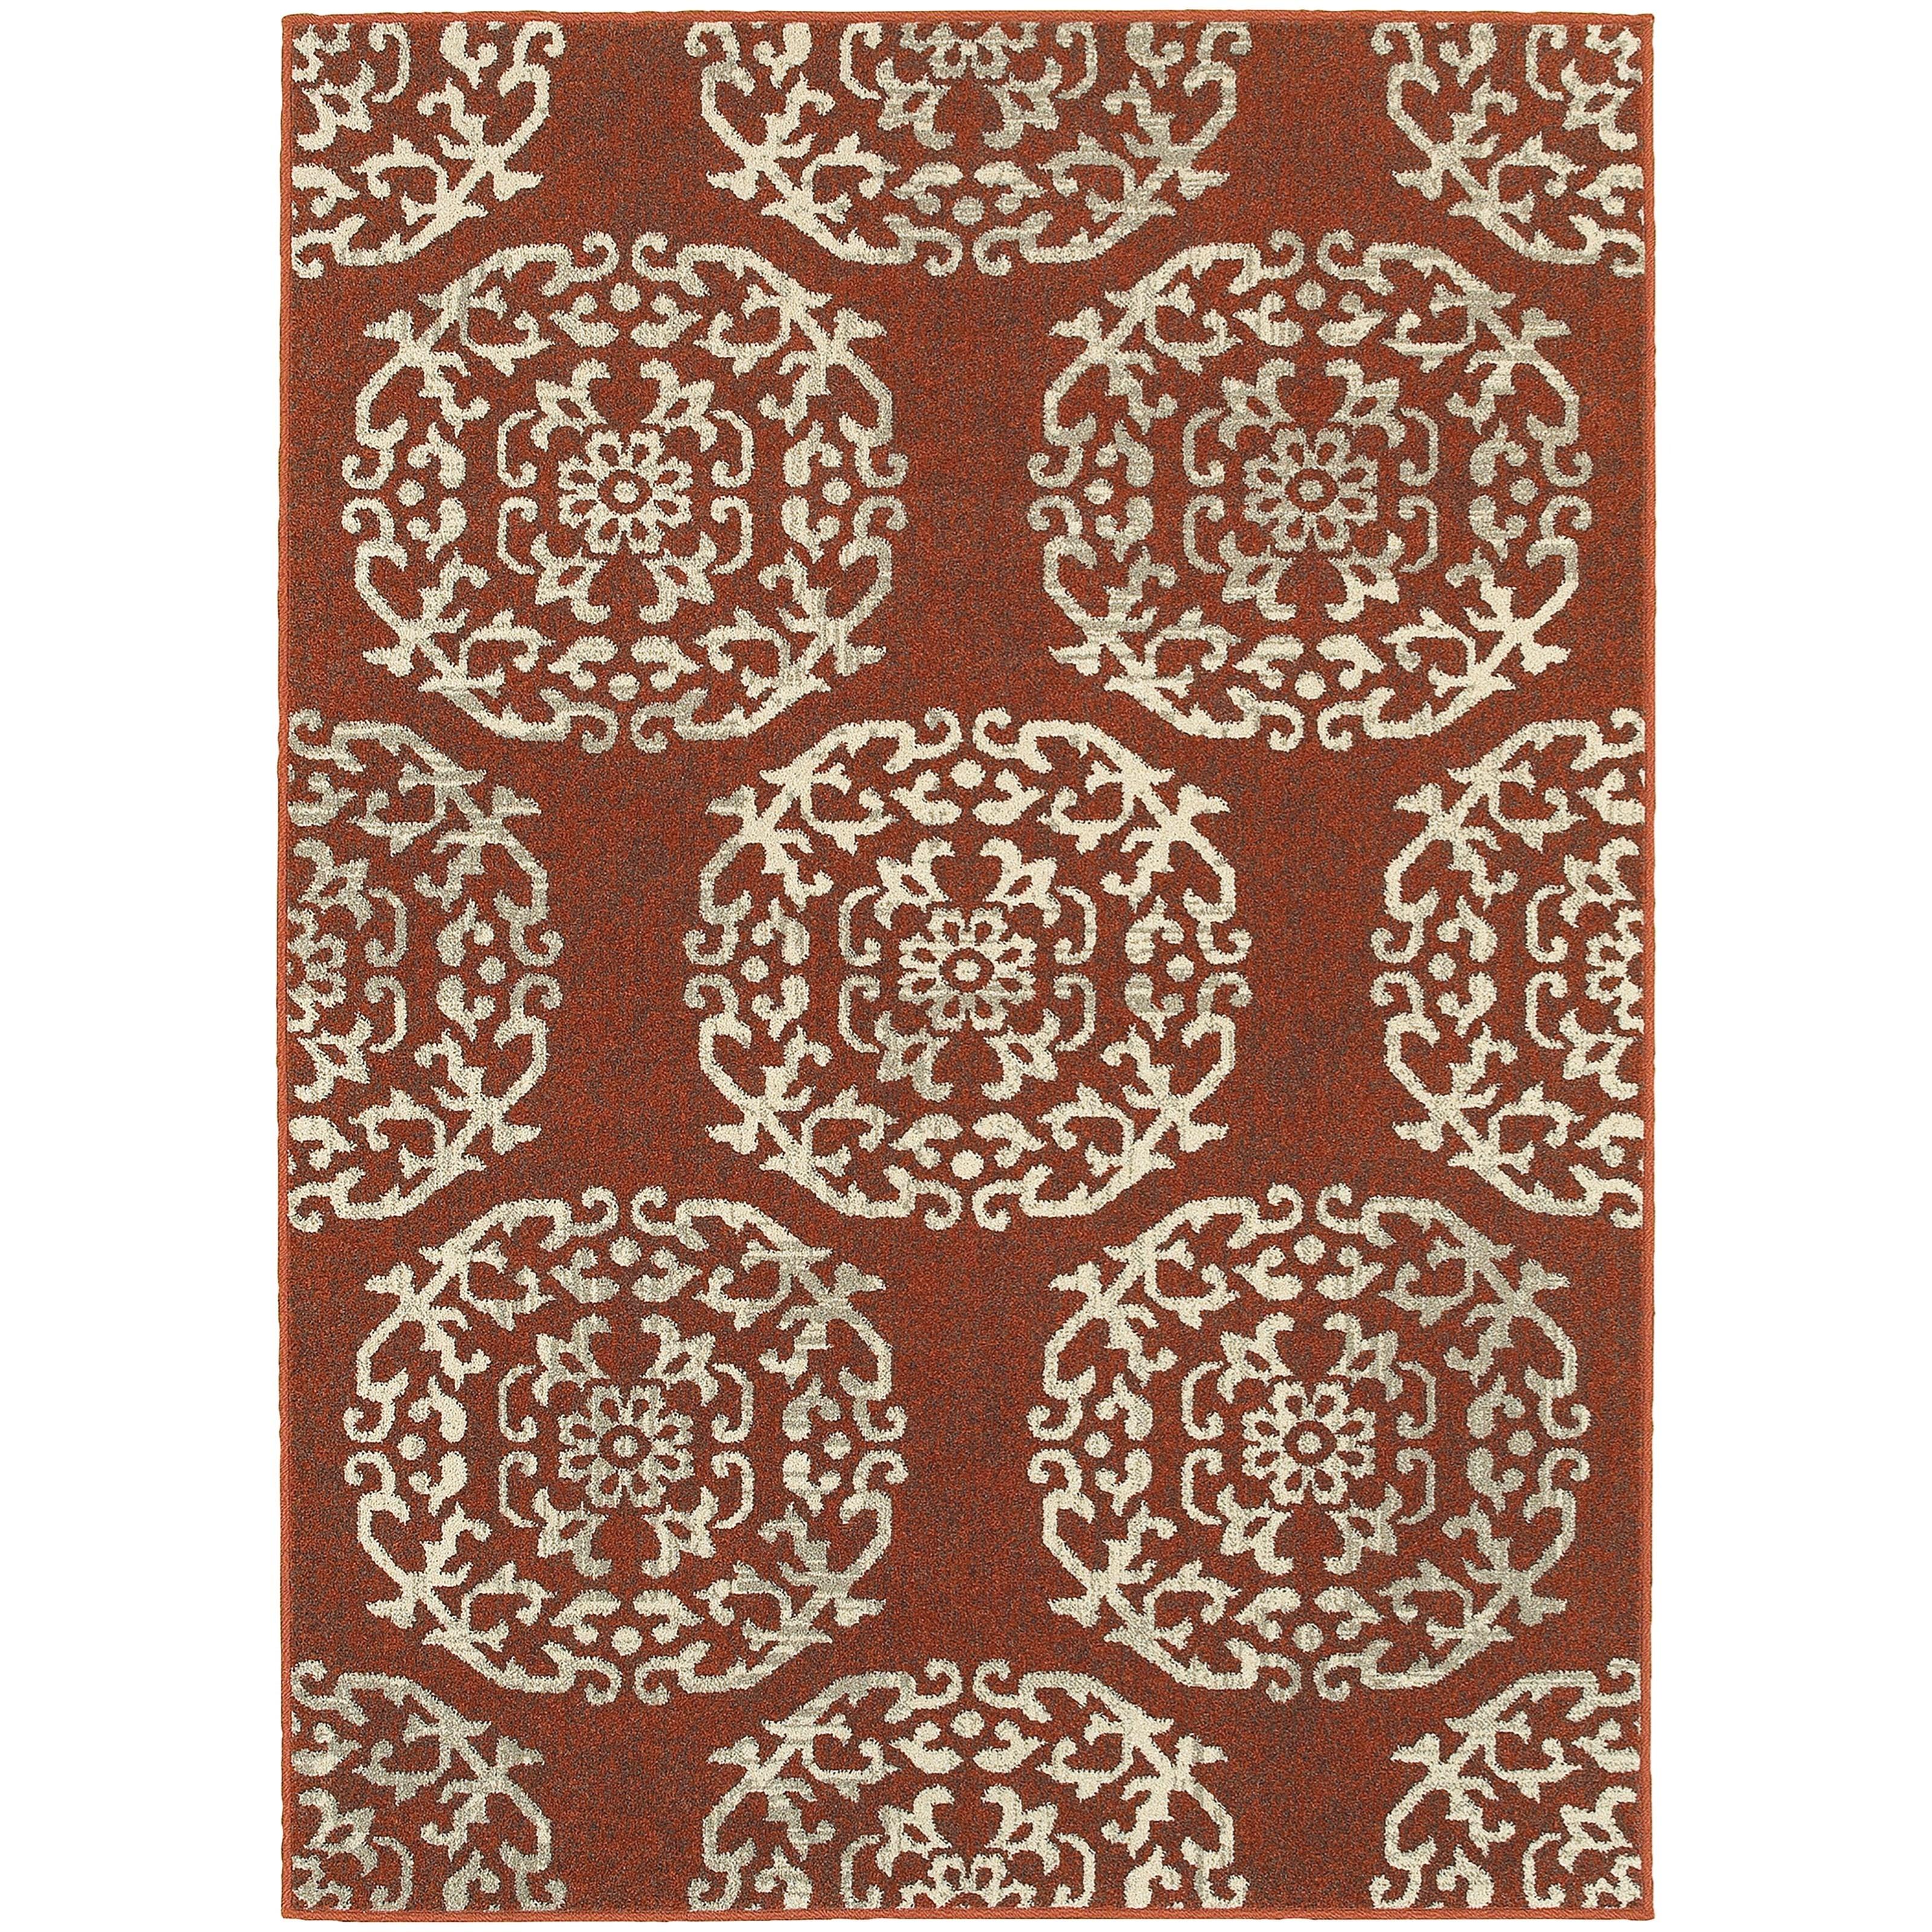 "Oriental Weavers Highlands 6' 7"" X  9' 6"" Rectangle Area Rug - Item Number: HIG6672B67X96"